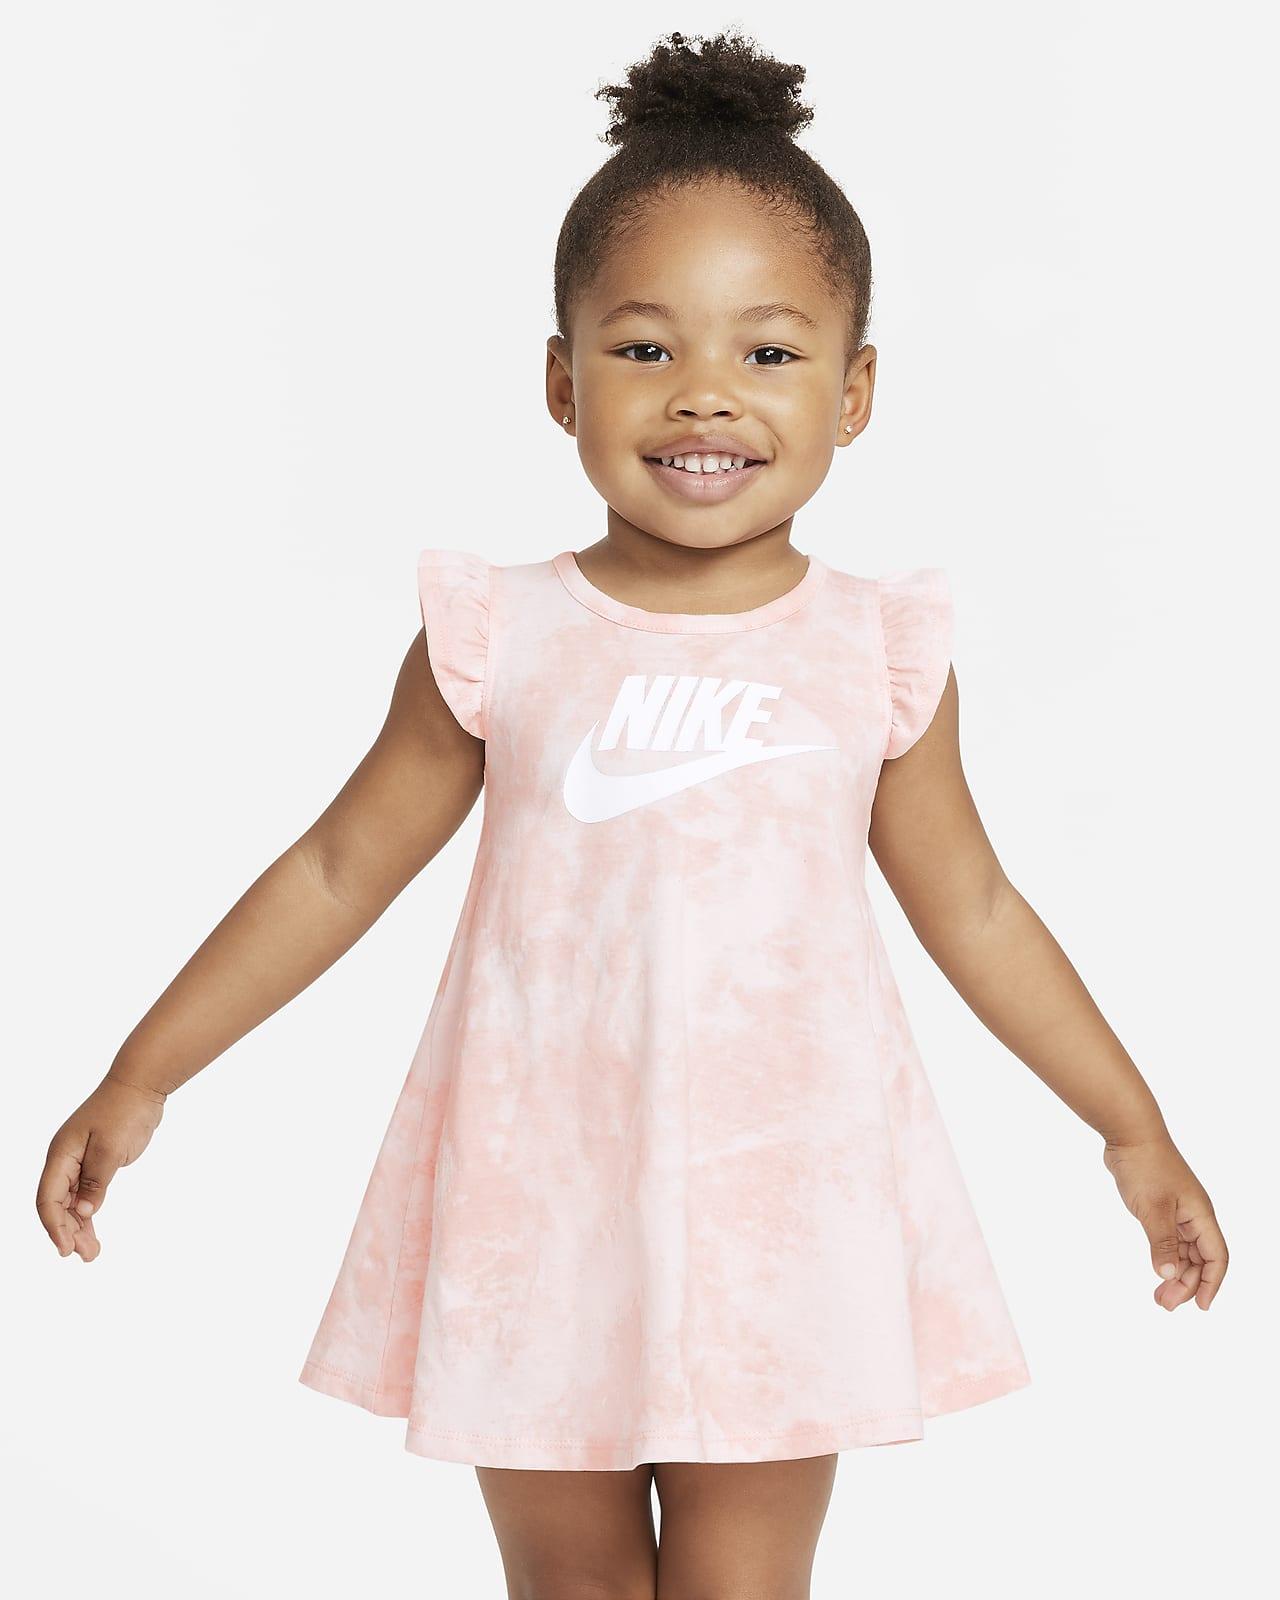 Vestido tie-dye para bebé Nike Sportswear (12 a 24 meses)